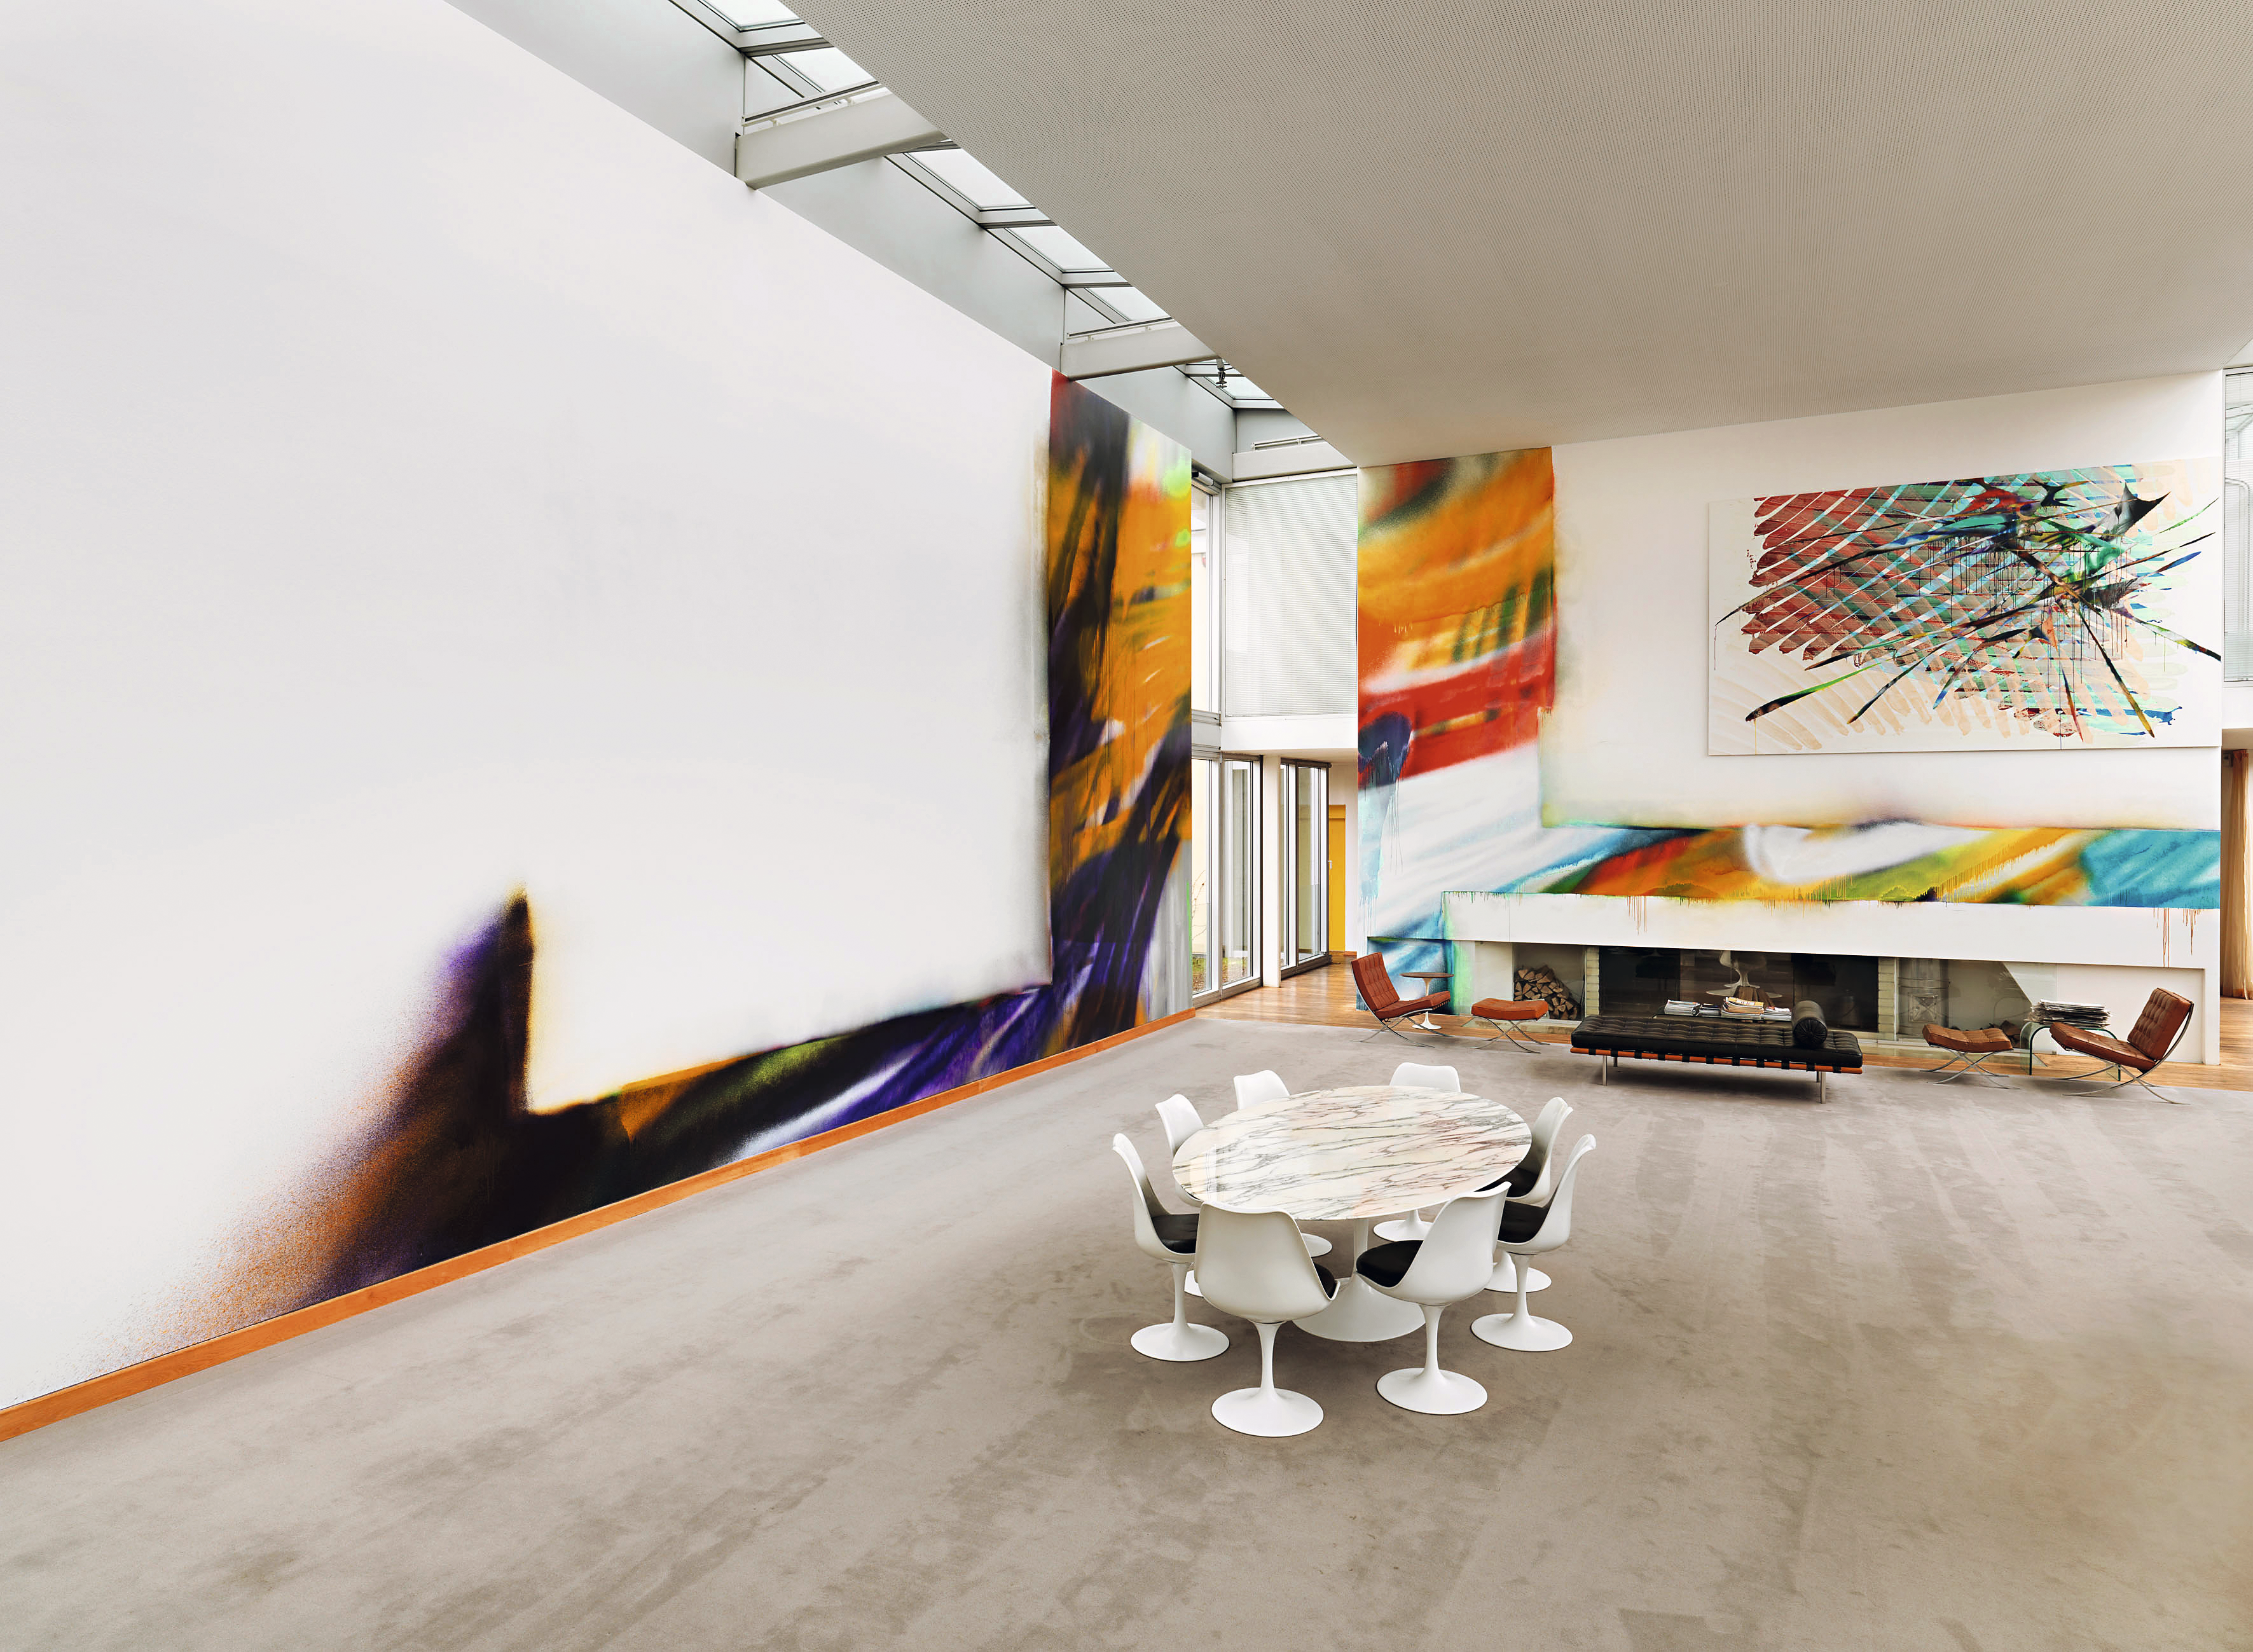 Obras de Katharina Grosse na coleção Galerie Hoffmann, Berlim